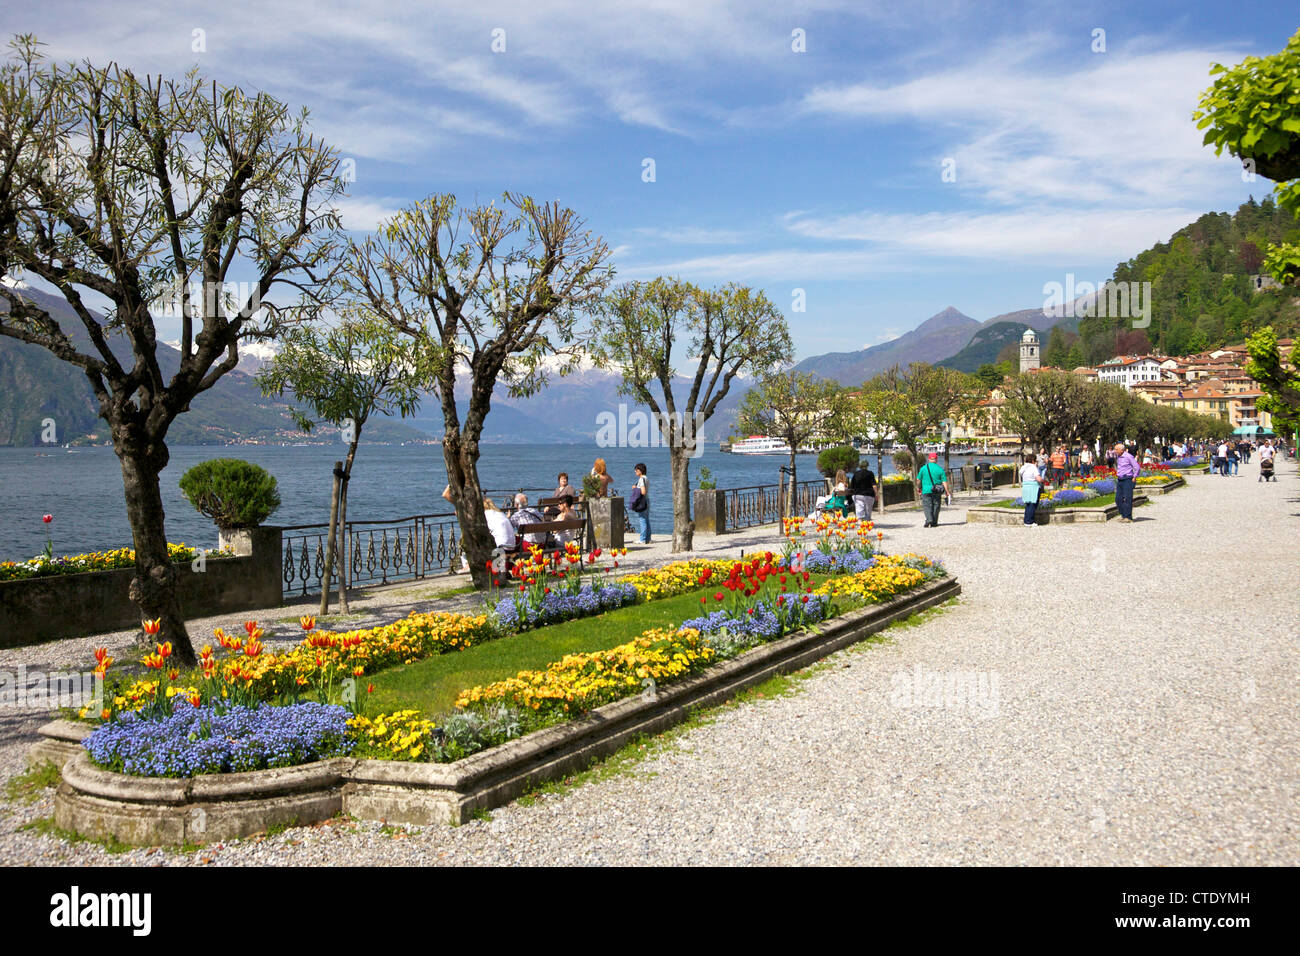 Public gardens in spring, Bellagio, Lake Como, Italy, Europe - Stock Image